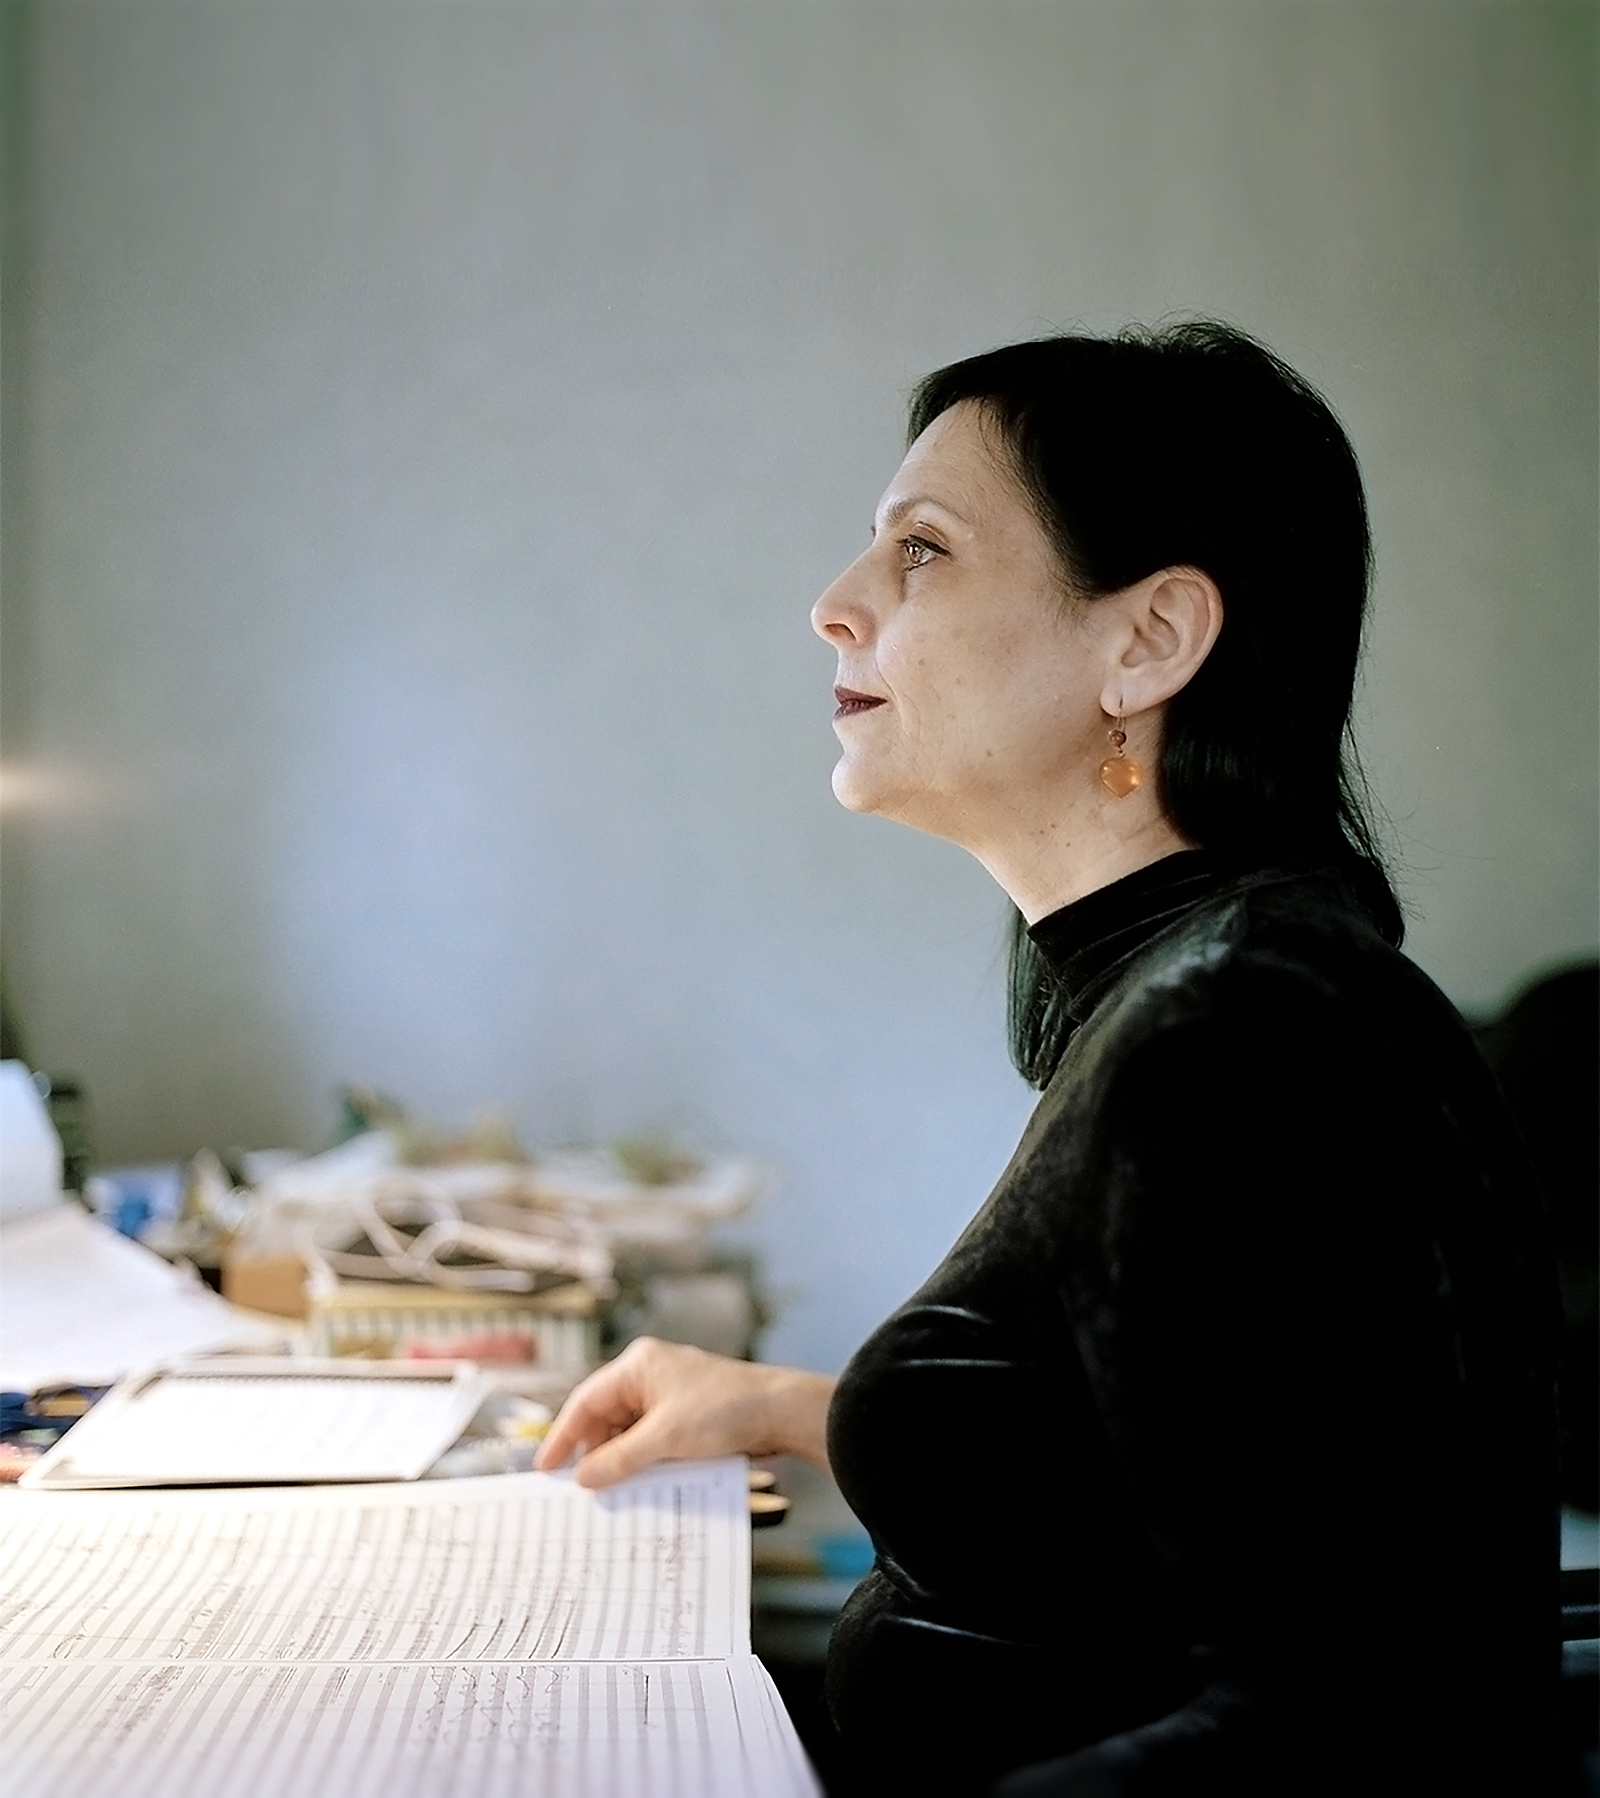 Chaya Czernowin (photo: Irina Rozovsky)